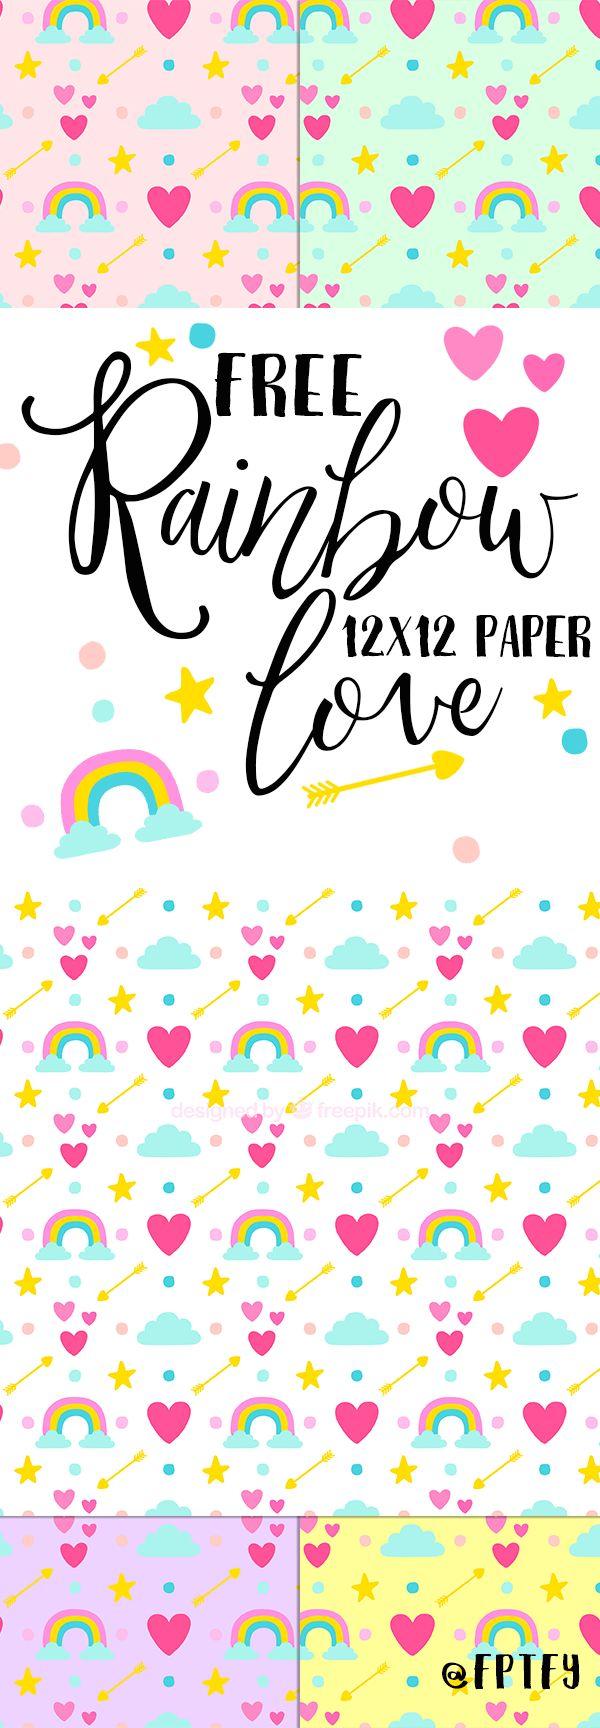 free-rainbow-love-12x12-digital-paper-fptfy-1